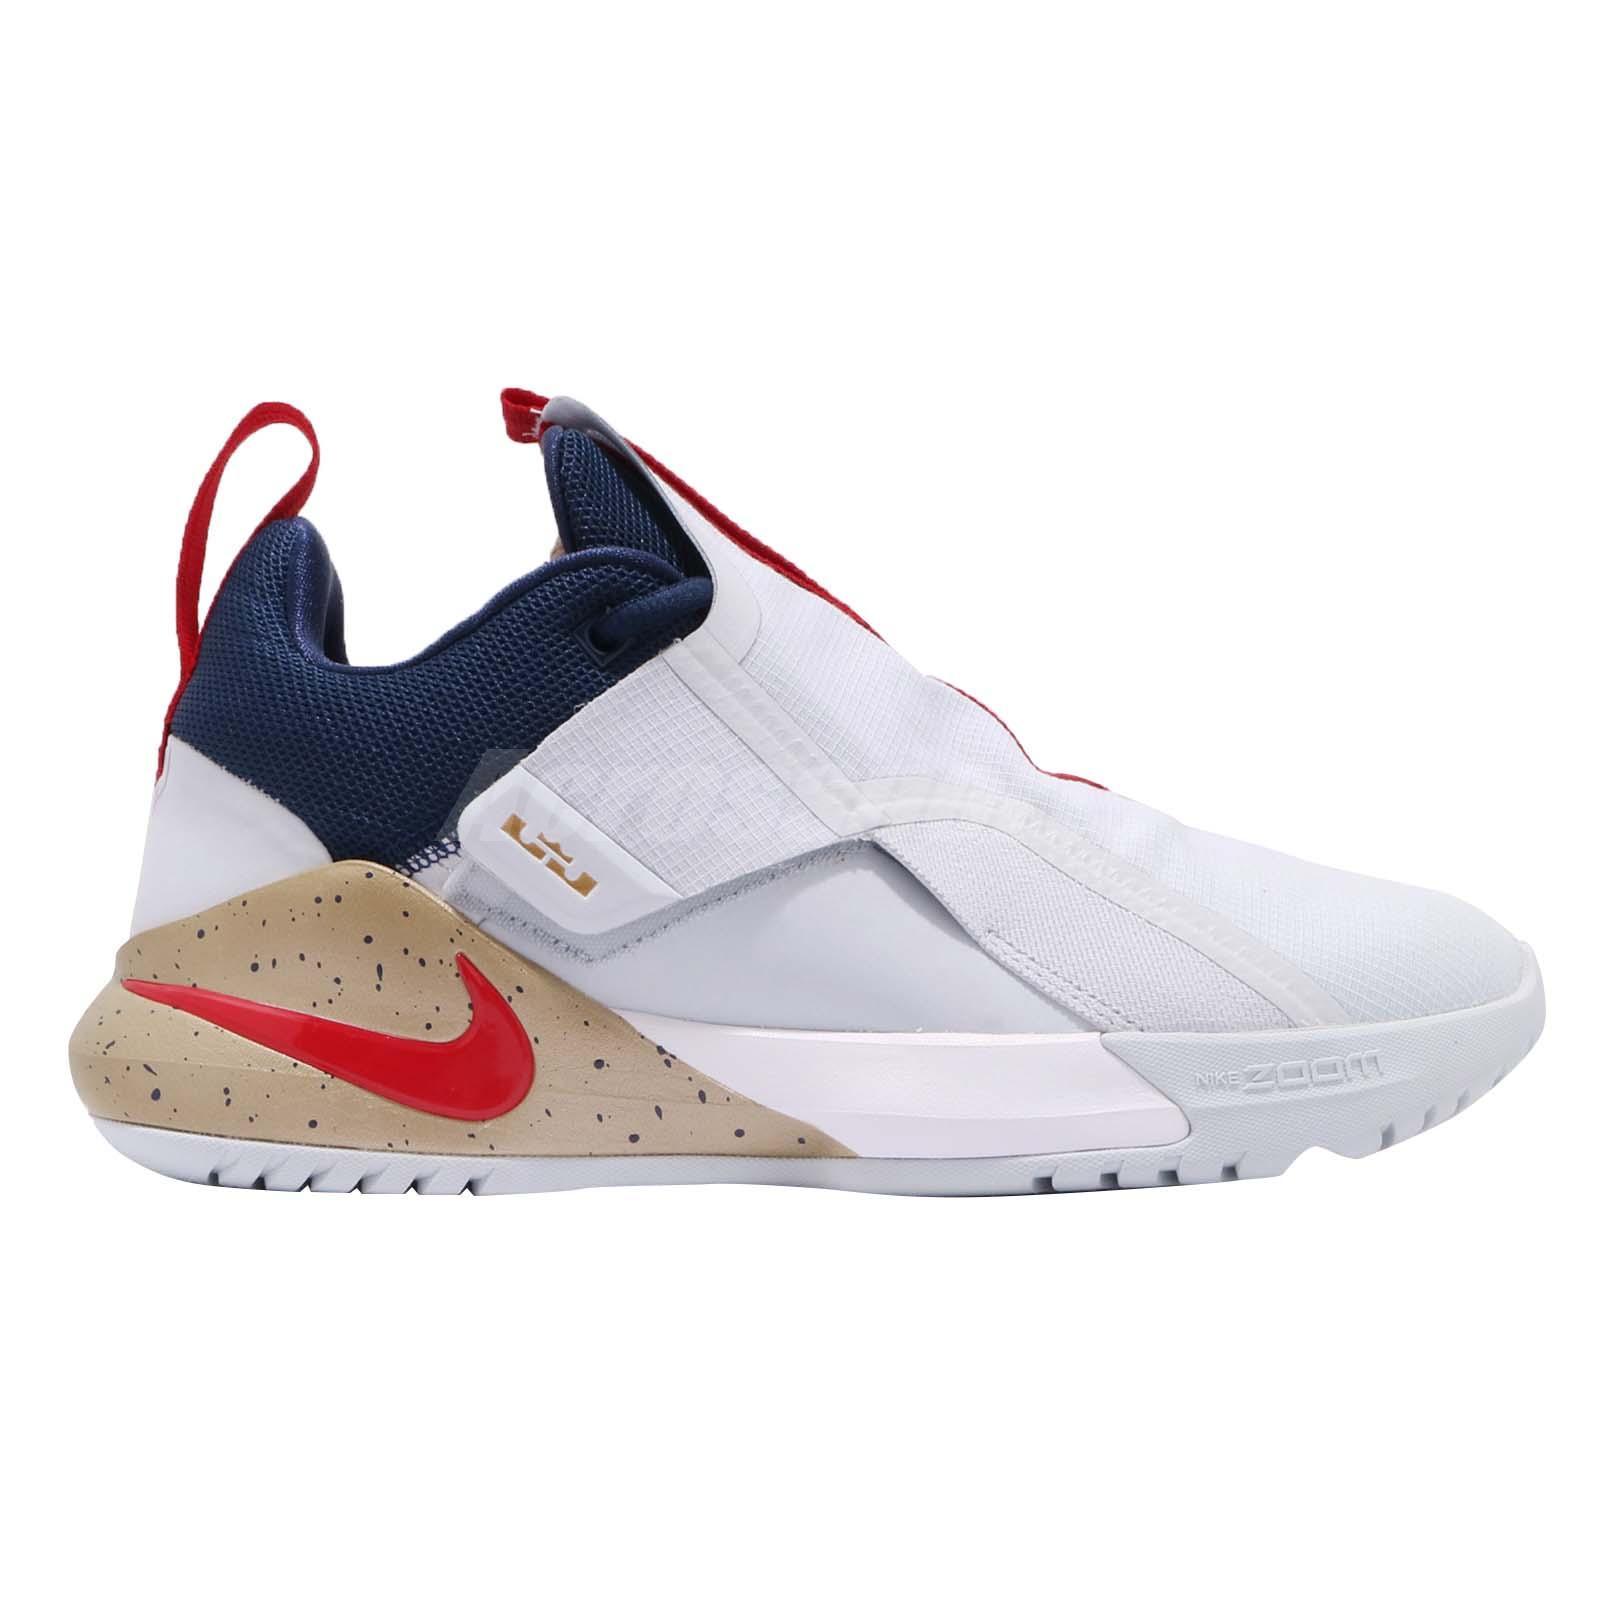 6324a1e78f1 Nike Ambassador XI 11 Lebron James LBJ White Red Gold Navy Men Shoes ...